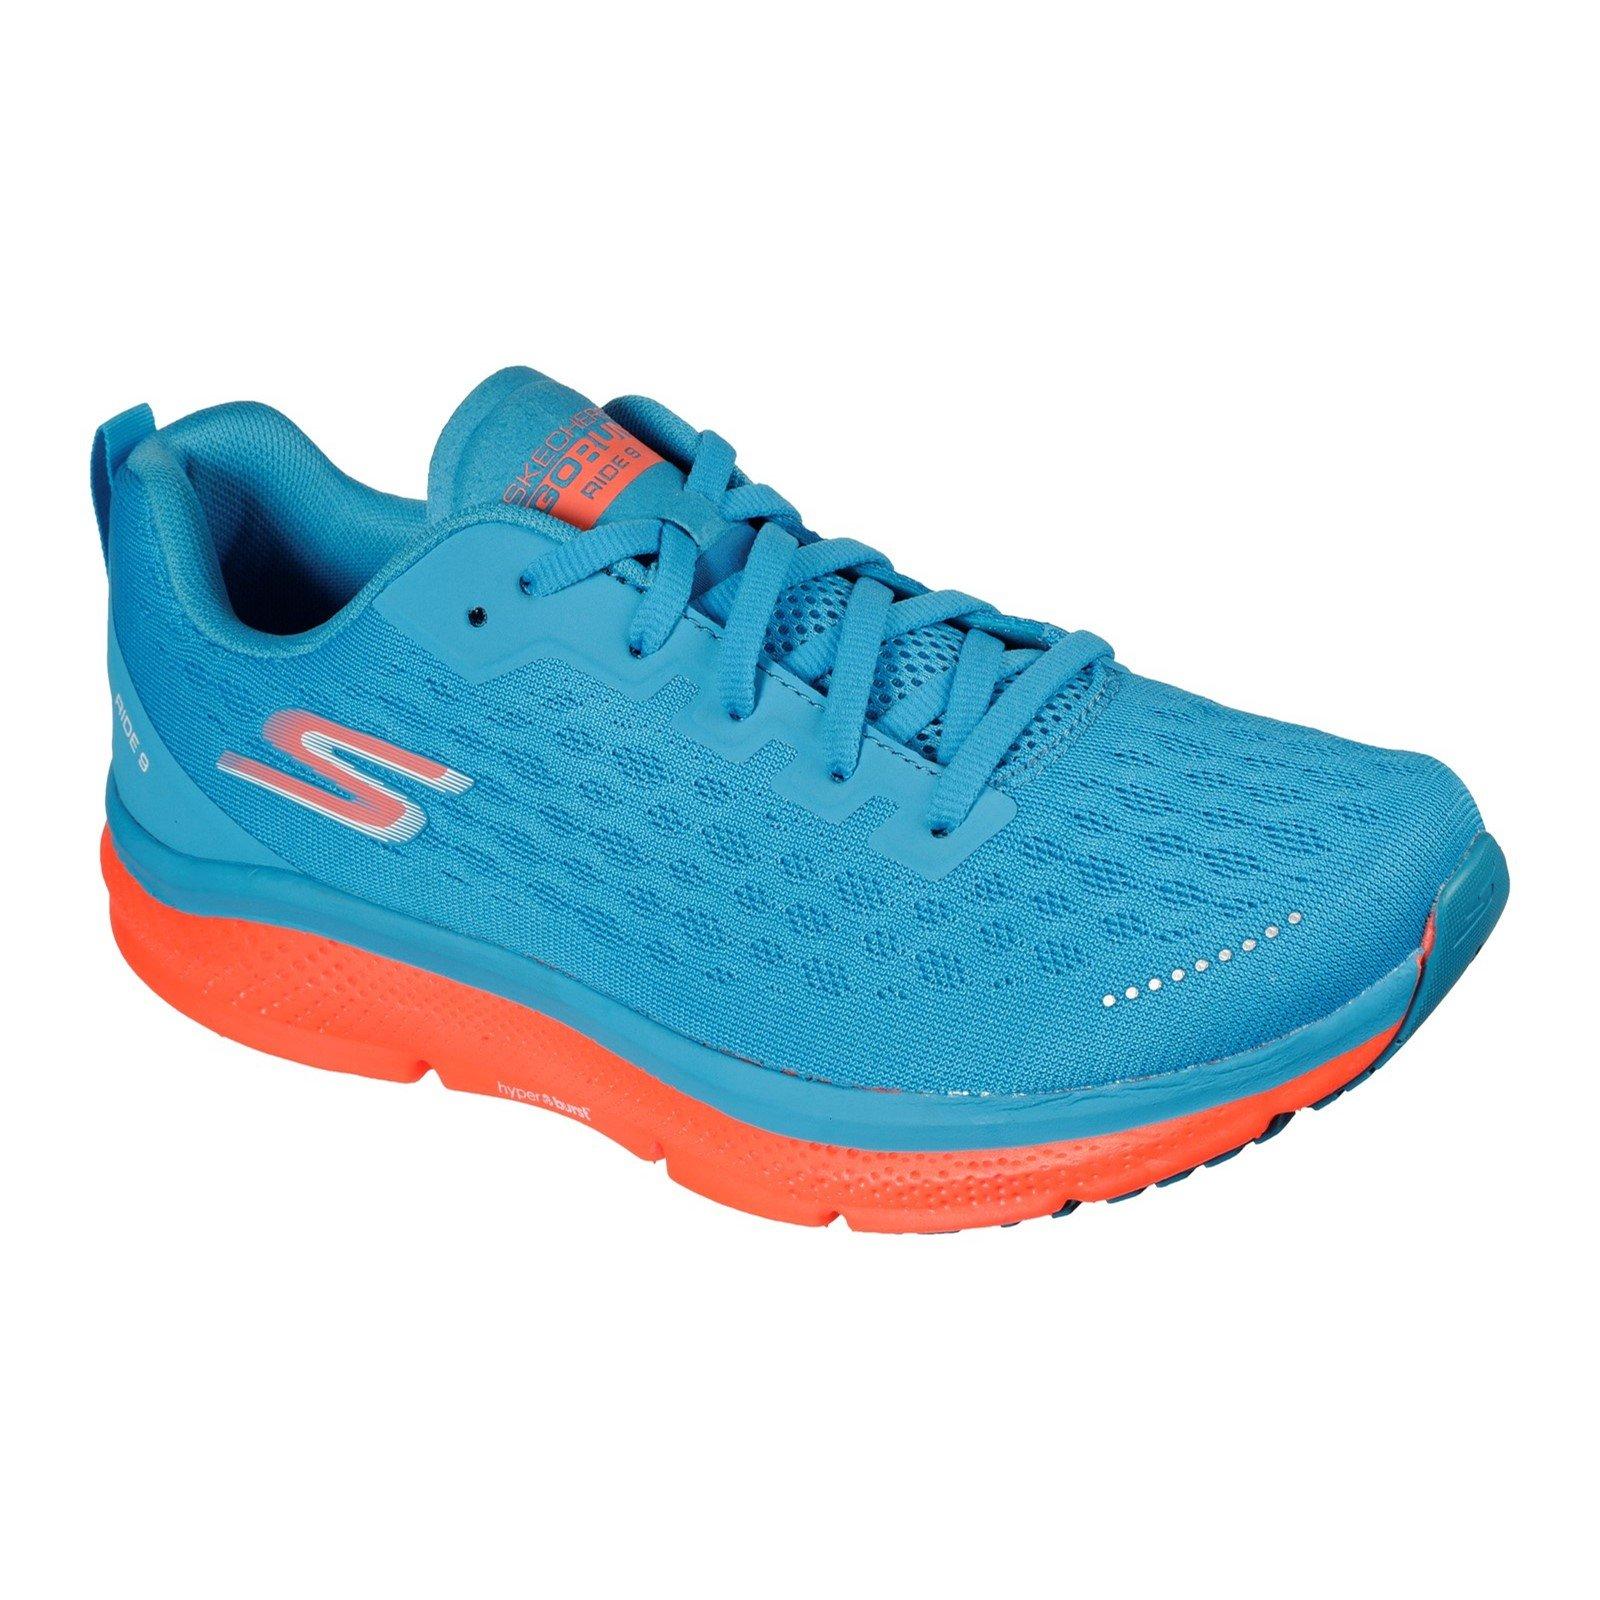 Skechers Men's Go Run Ride 9 Trainer Various Colours 32701 - Blue/Coral 12